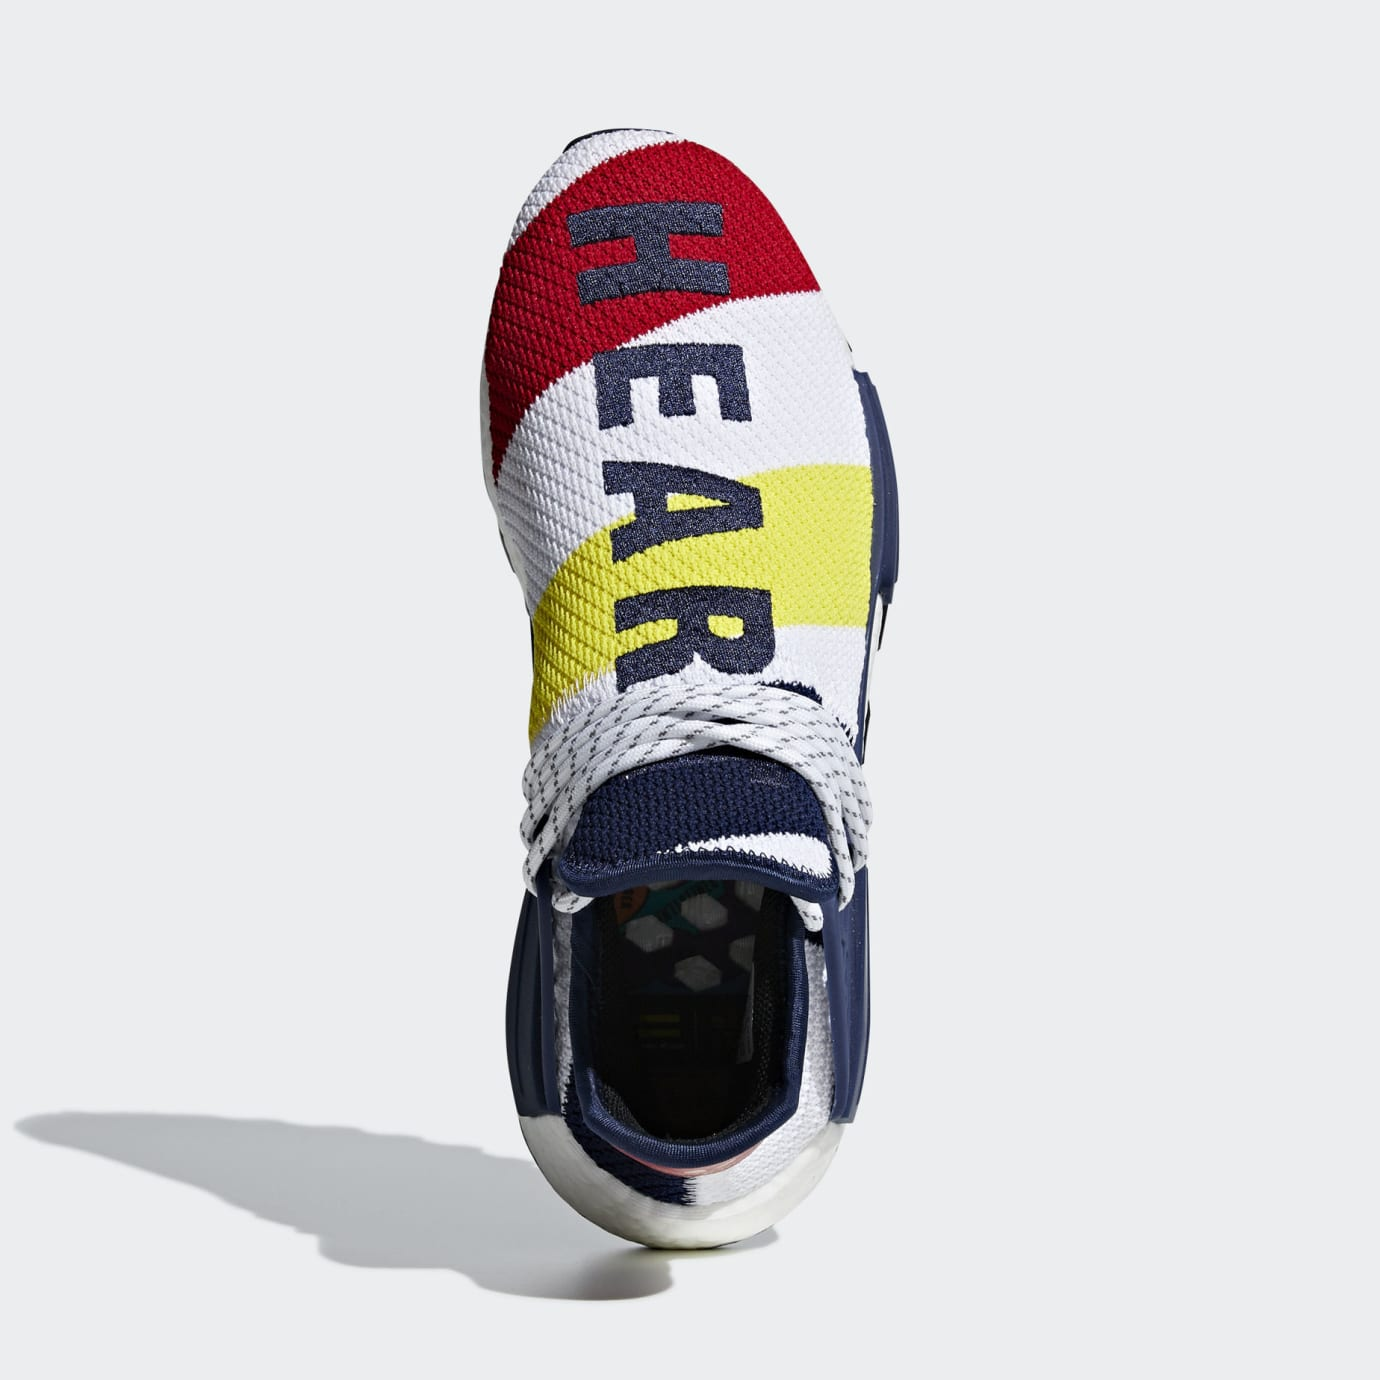 60ab8270a60eea Image via Adidas bbc-pharrell-adidas-nmd-hu-bb9544-top